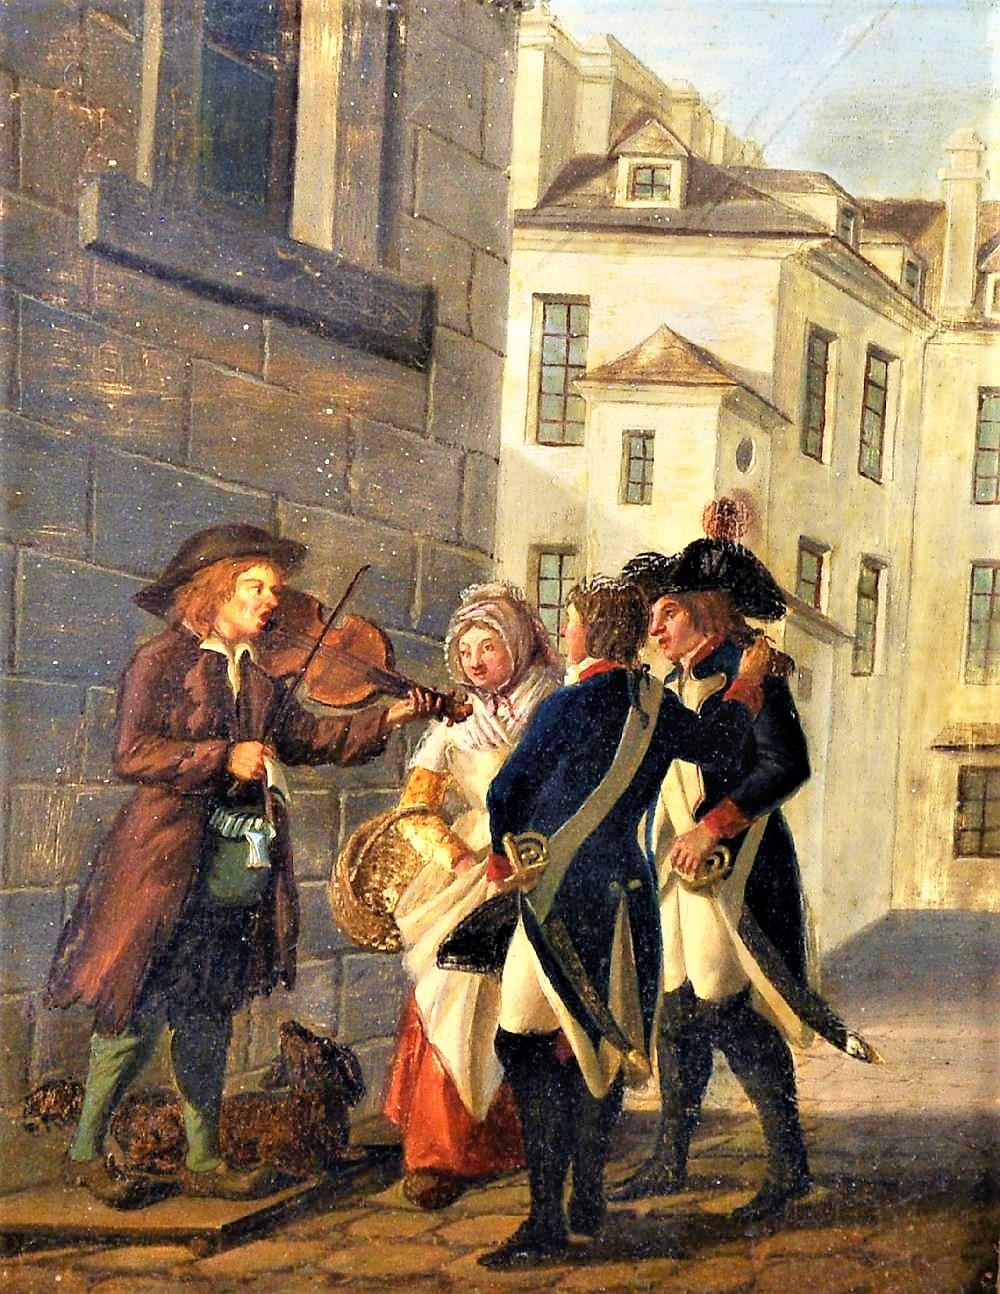 Gabriel Jaques de Saint Aubin (1724-1780) French. The Itinerary musician